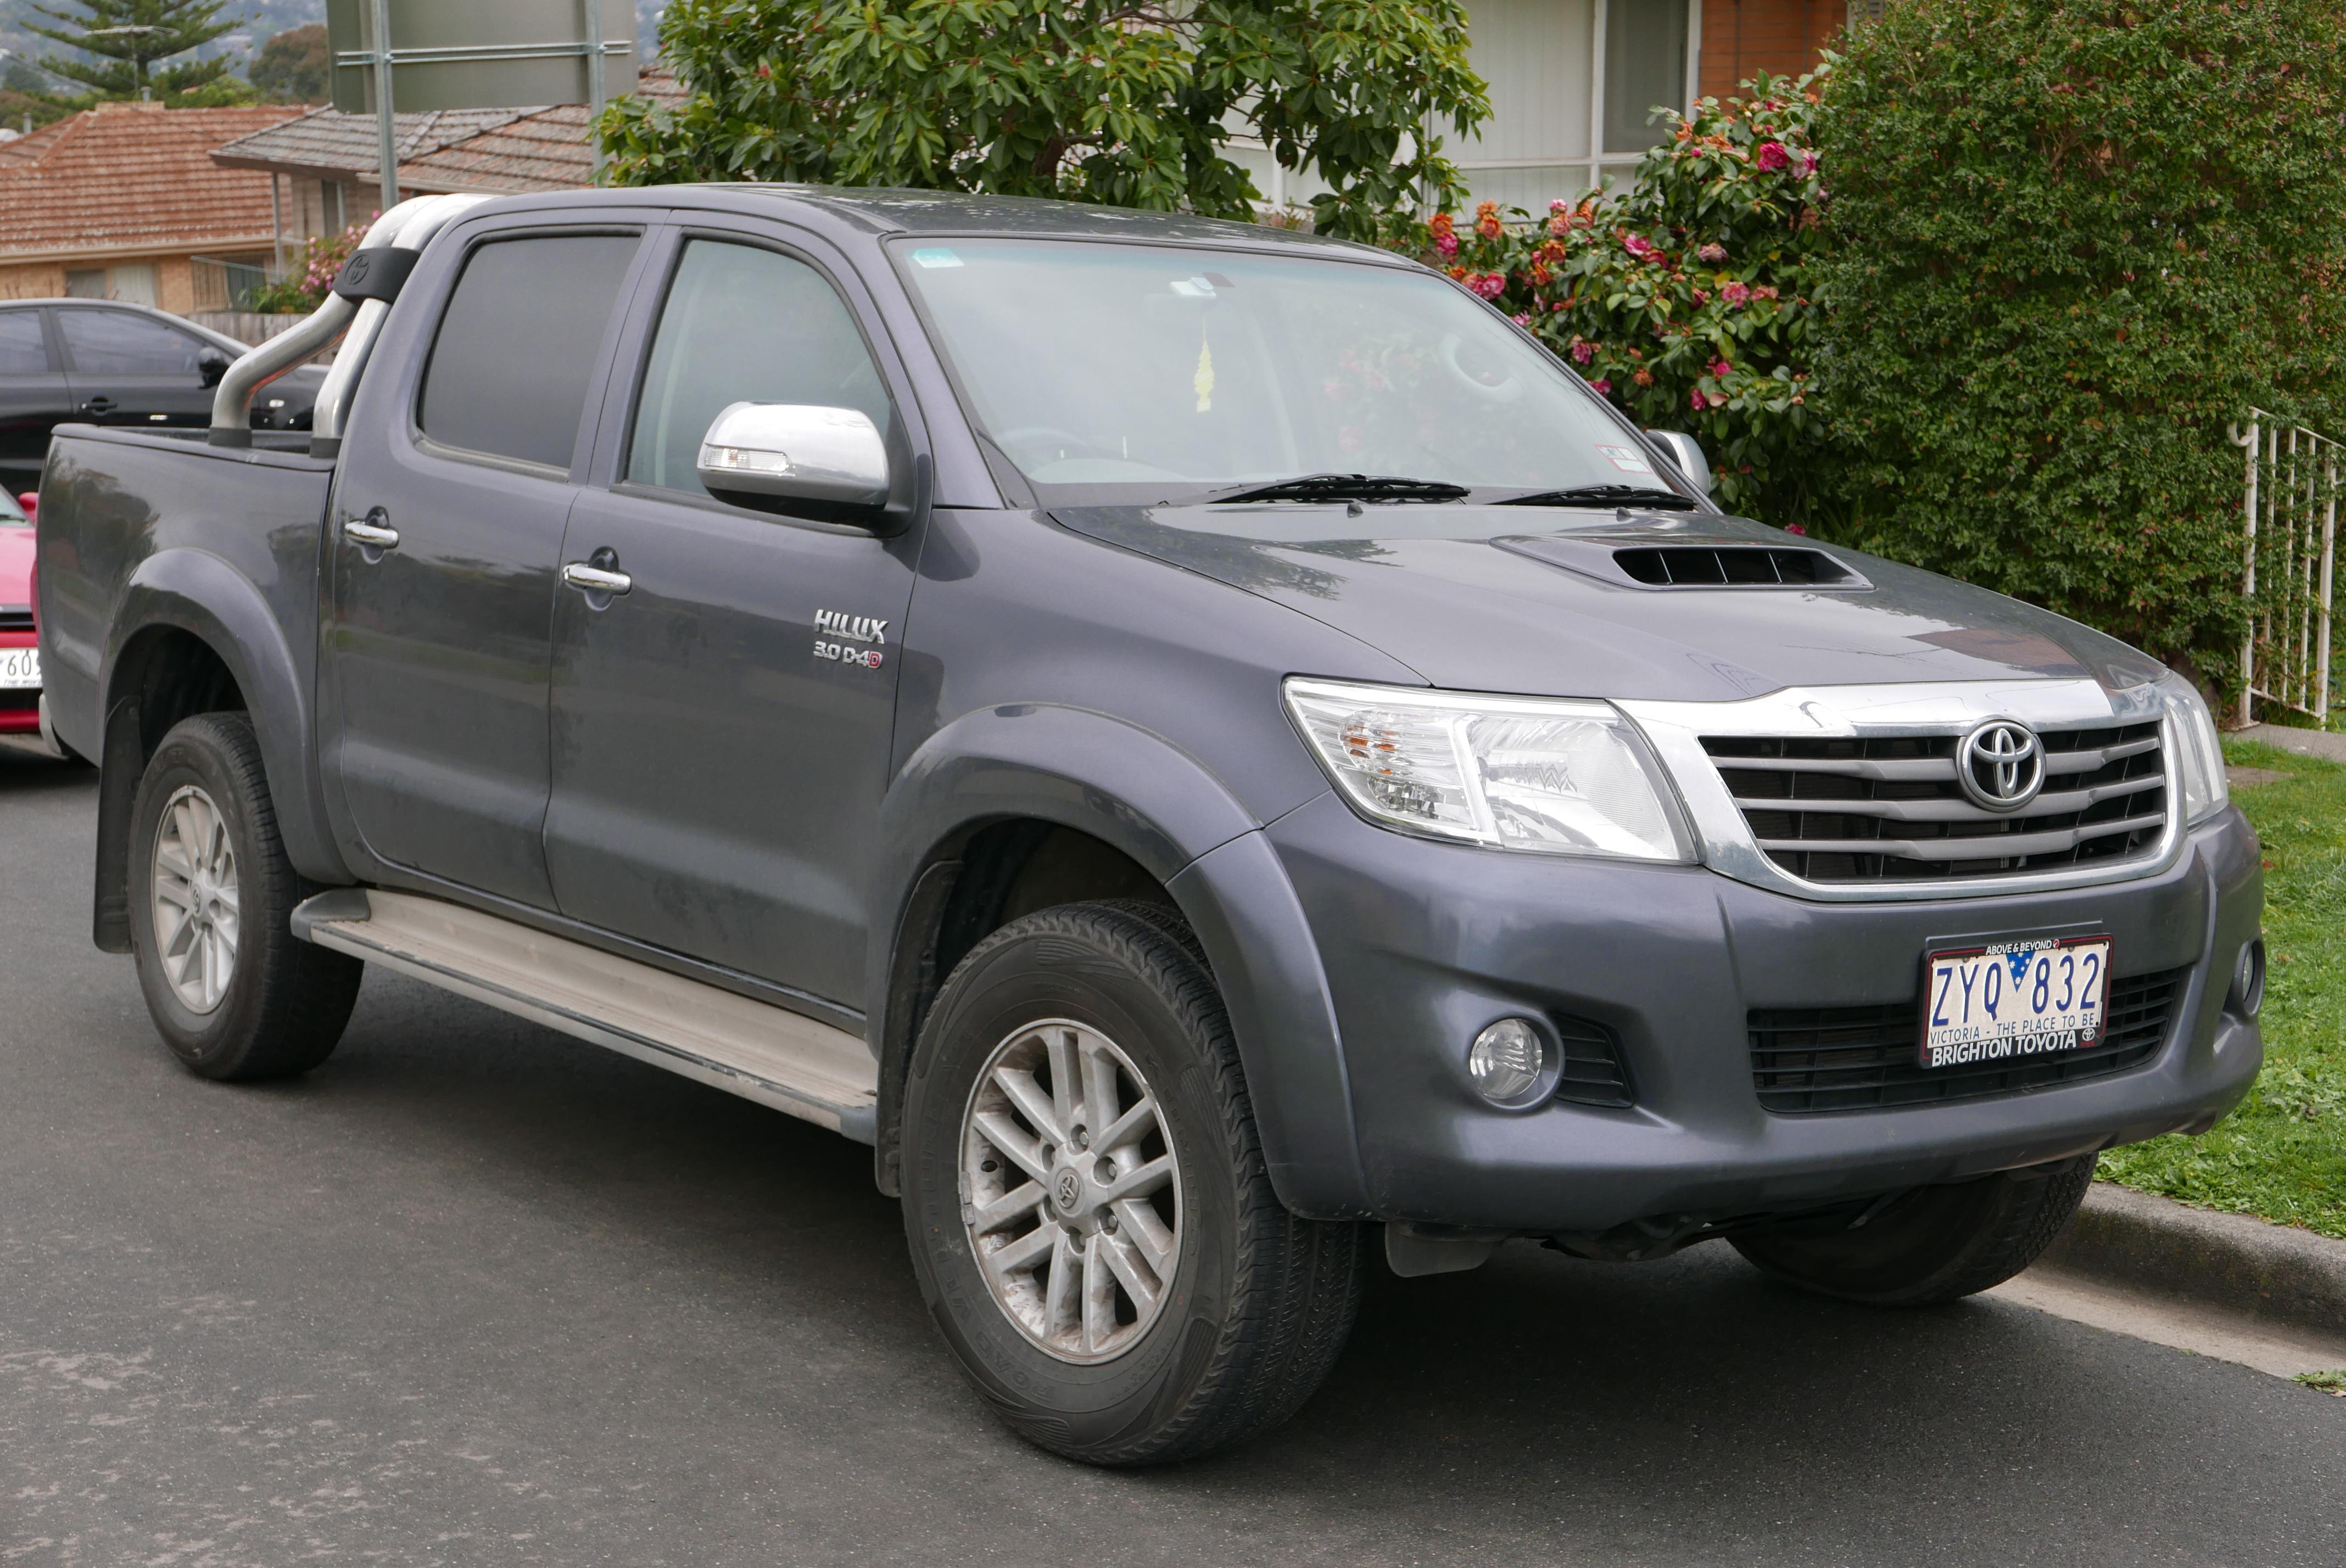 File:2013 Toyota HiLux (KUN26R MY12) SR5 4-door utility ...